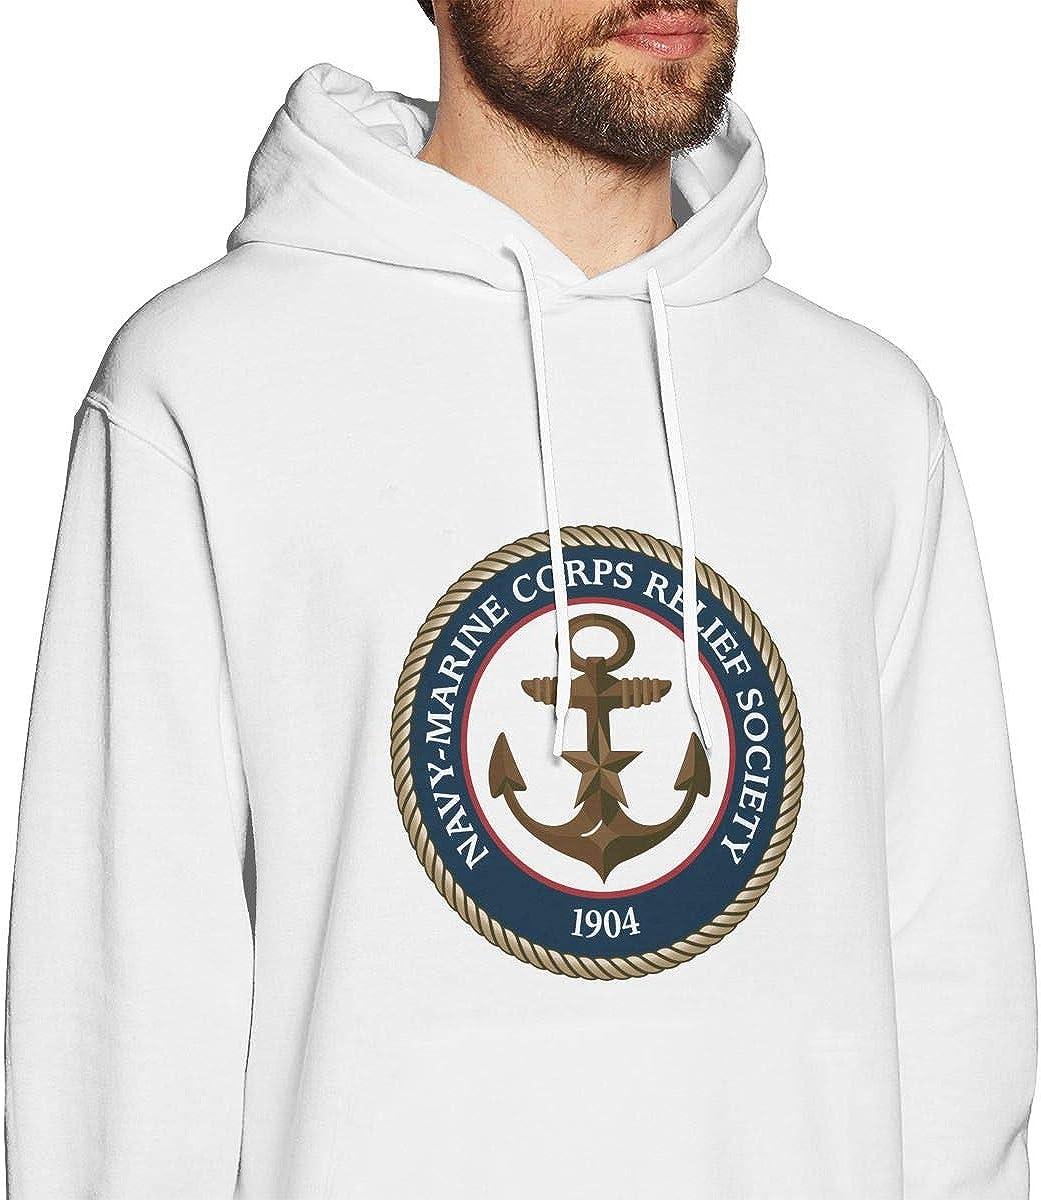 Navy Marine Corps Relief Society Mens Hooded Sweatshirt Theme Printed Fashion Hoodie